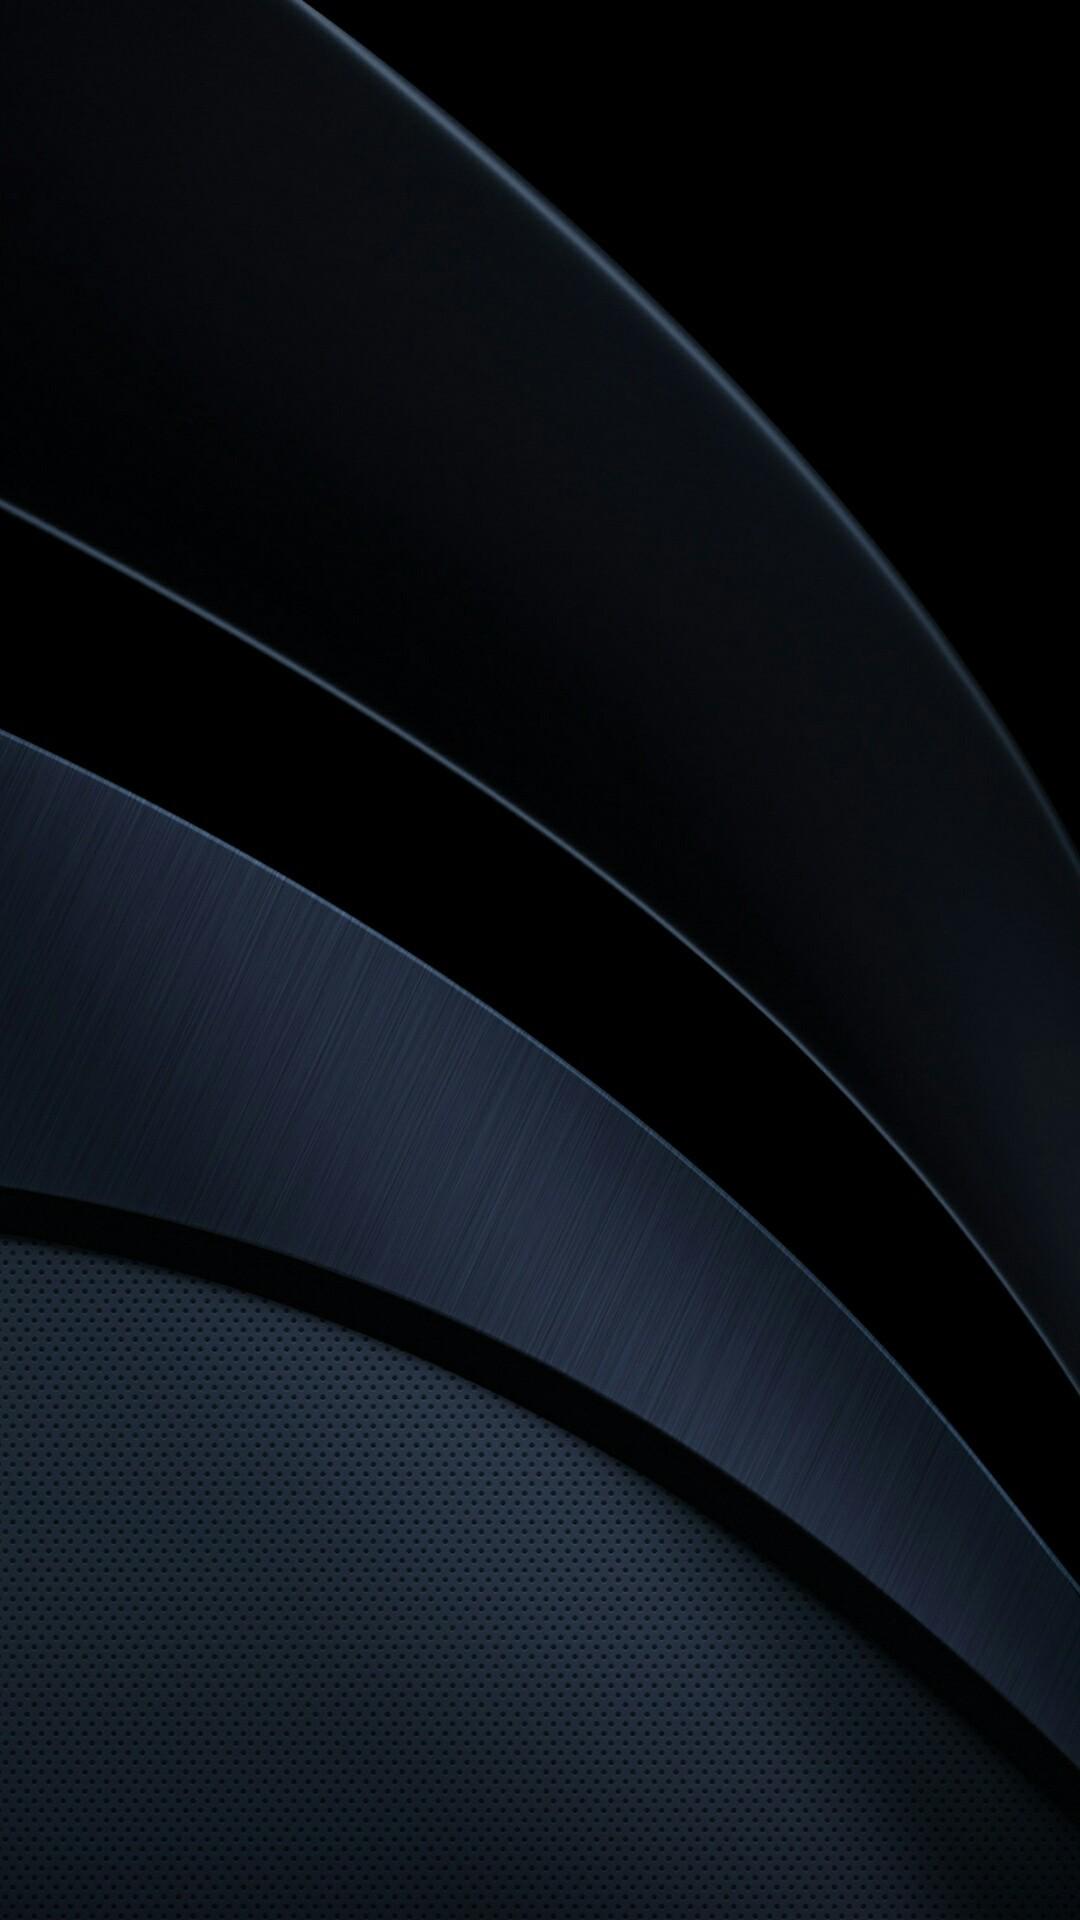 Fondos. Black WallpaperWallpaper ArtBlue WallpapersPhone …